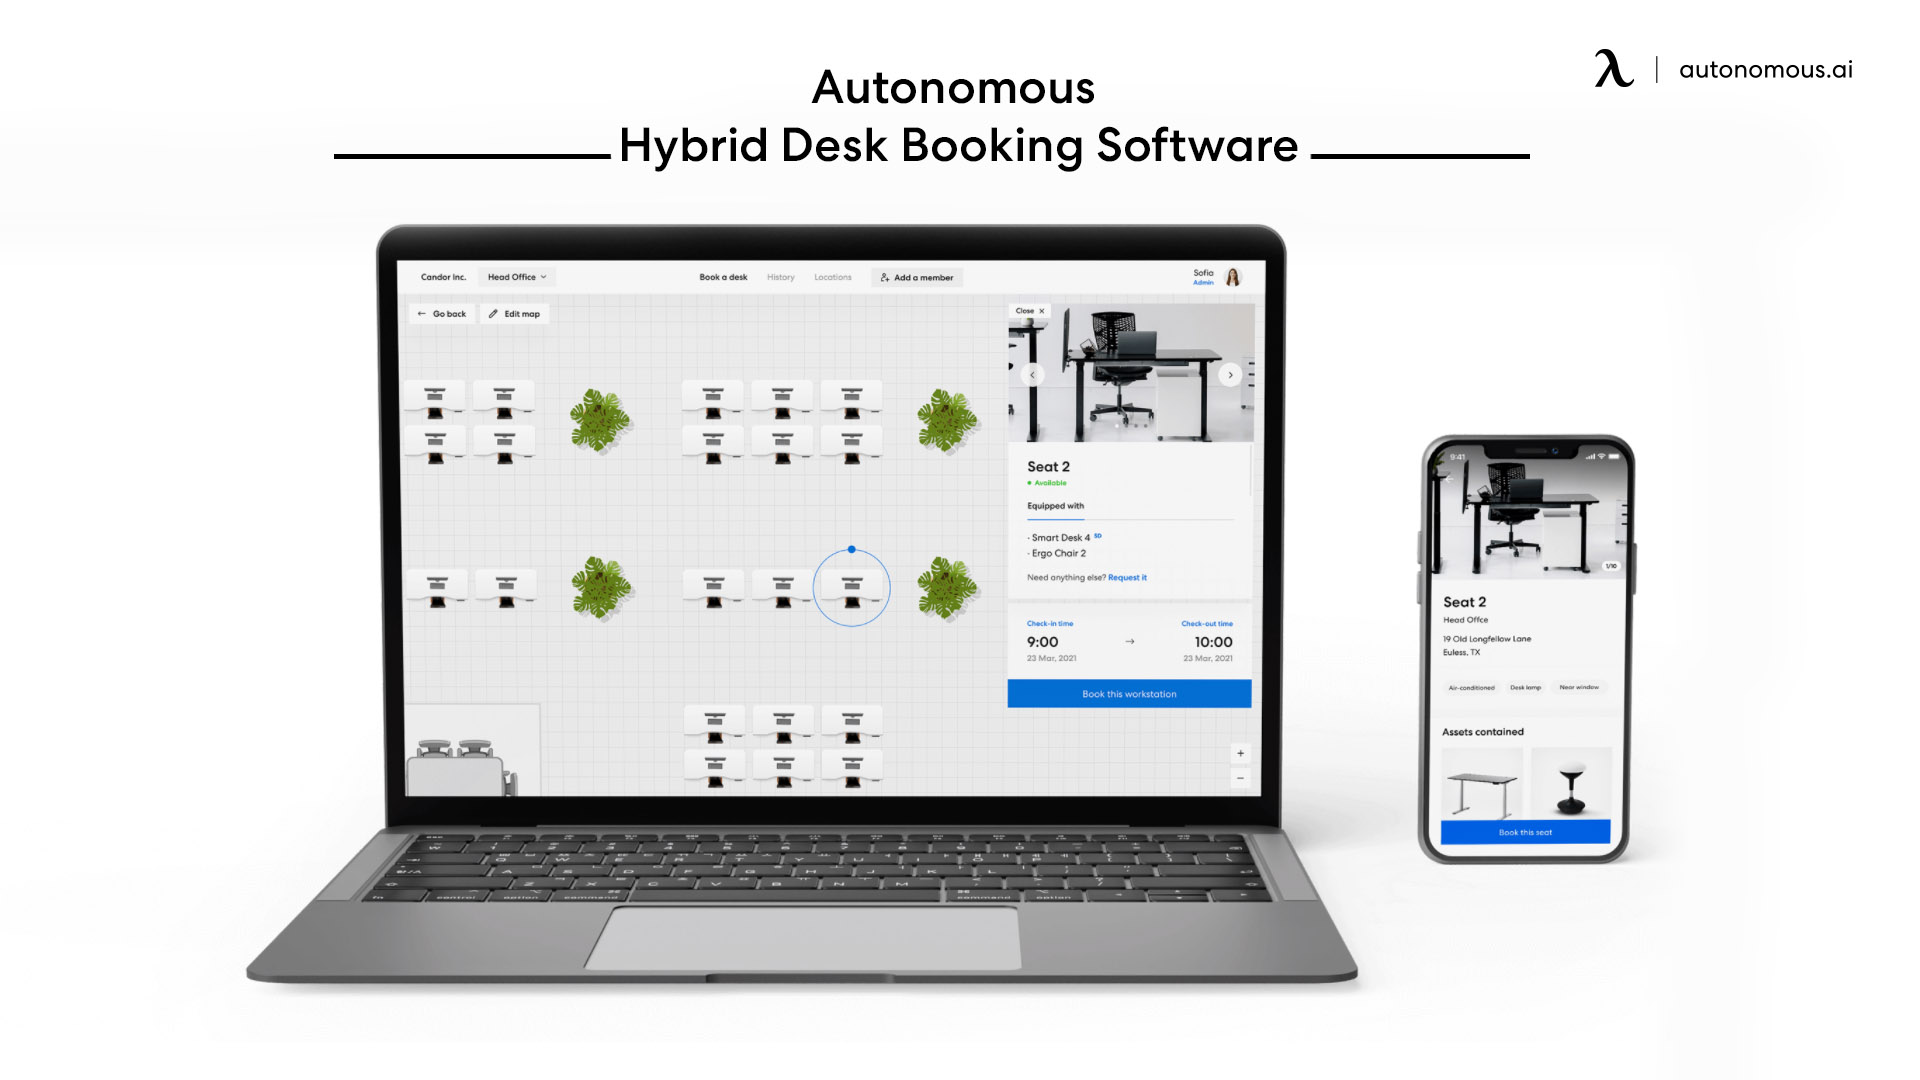 Install Reservation Software or an Autonomous Hybrid App